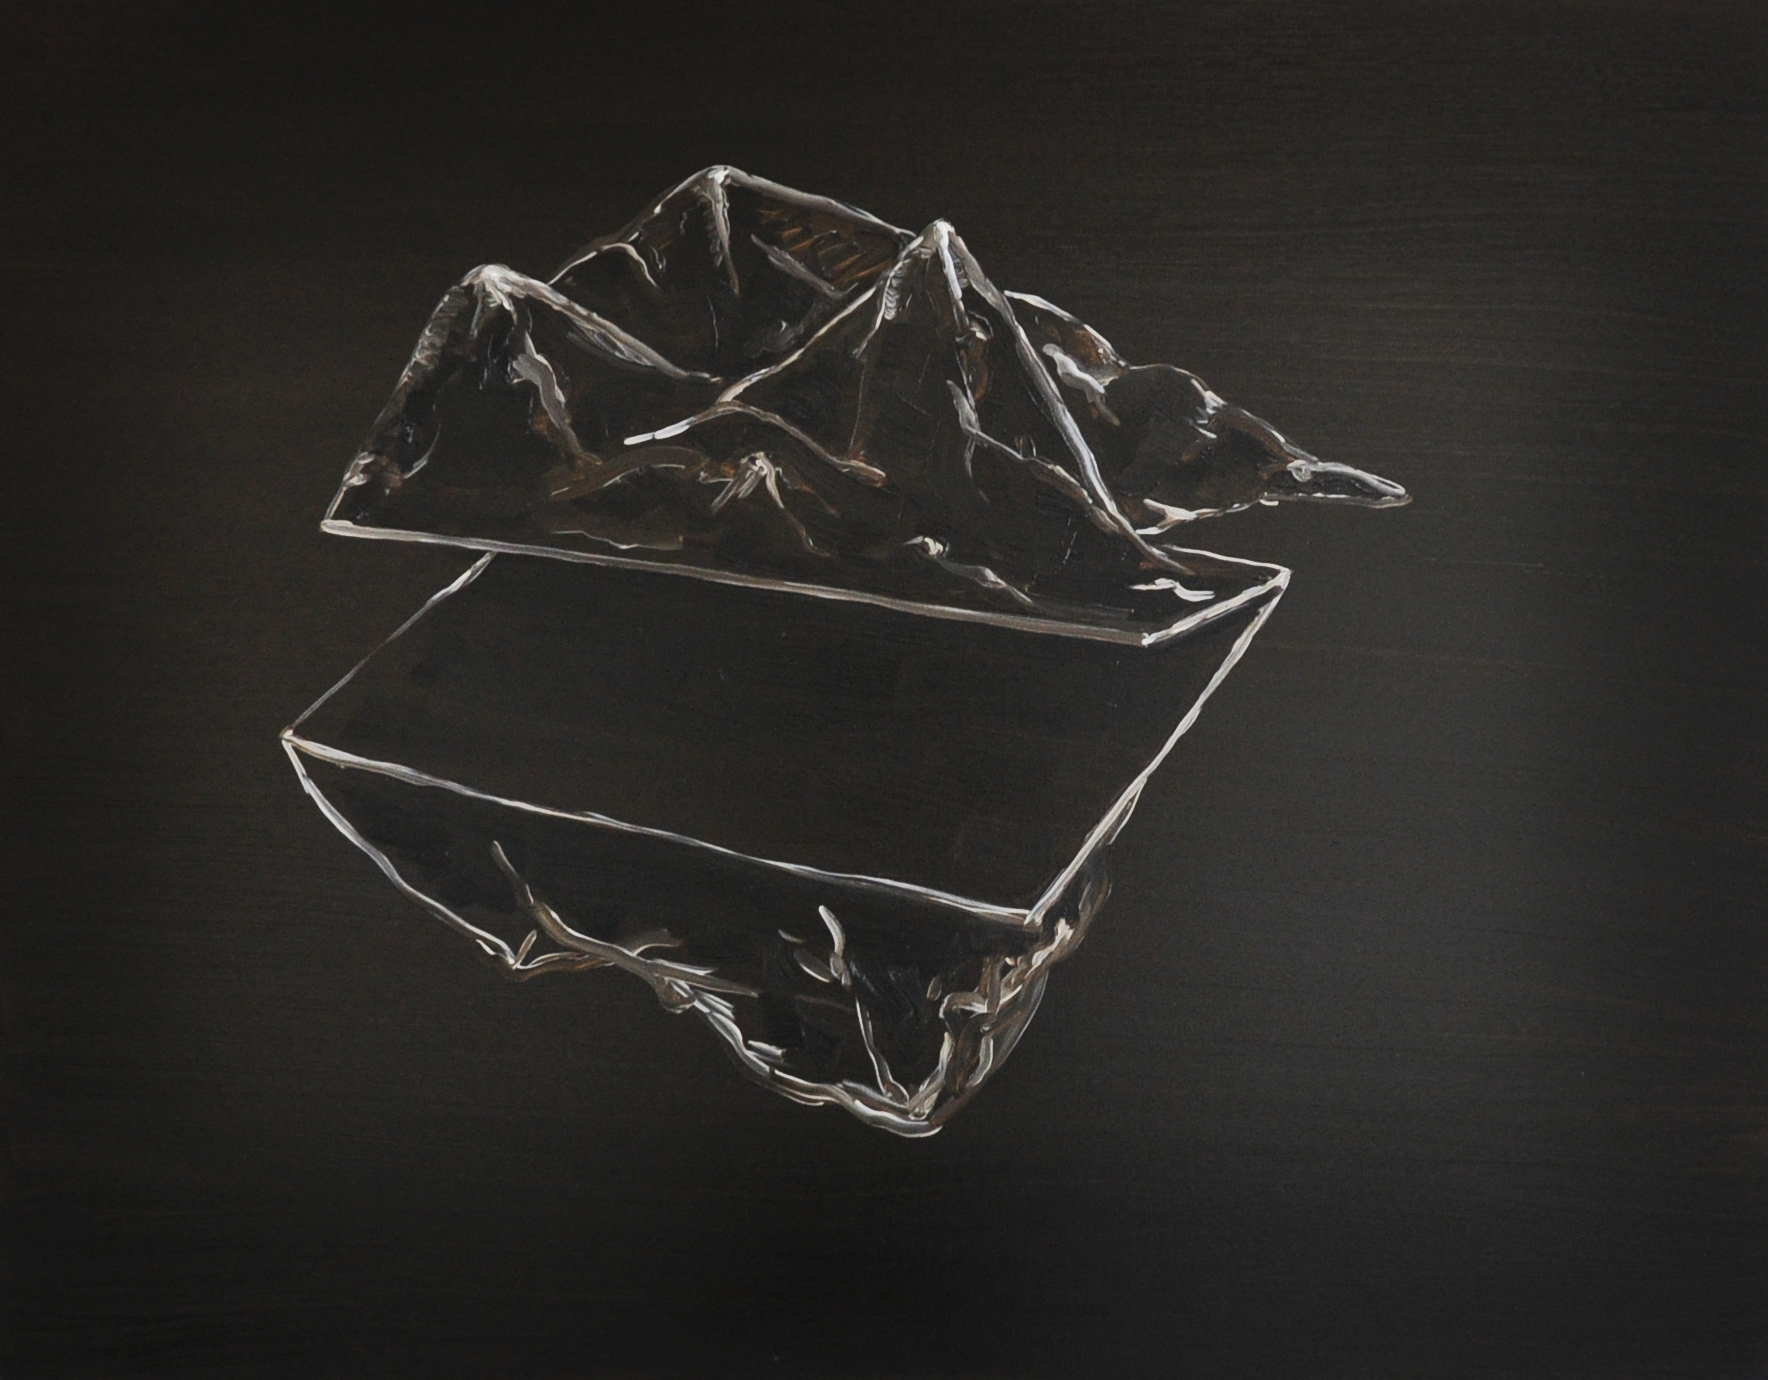 Parallel Ridge, 2011, Oil on cotton, 70 x 90 cm